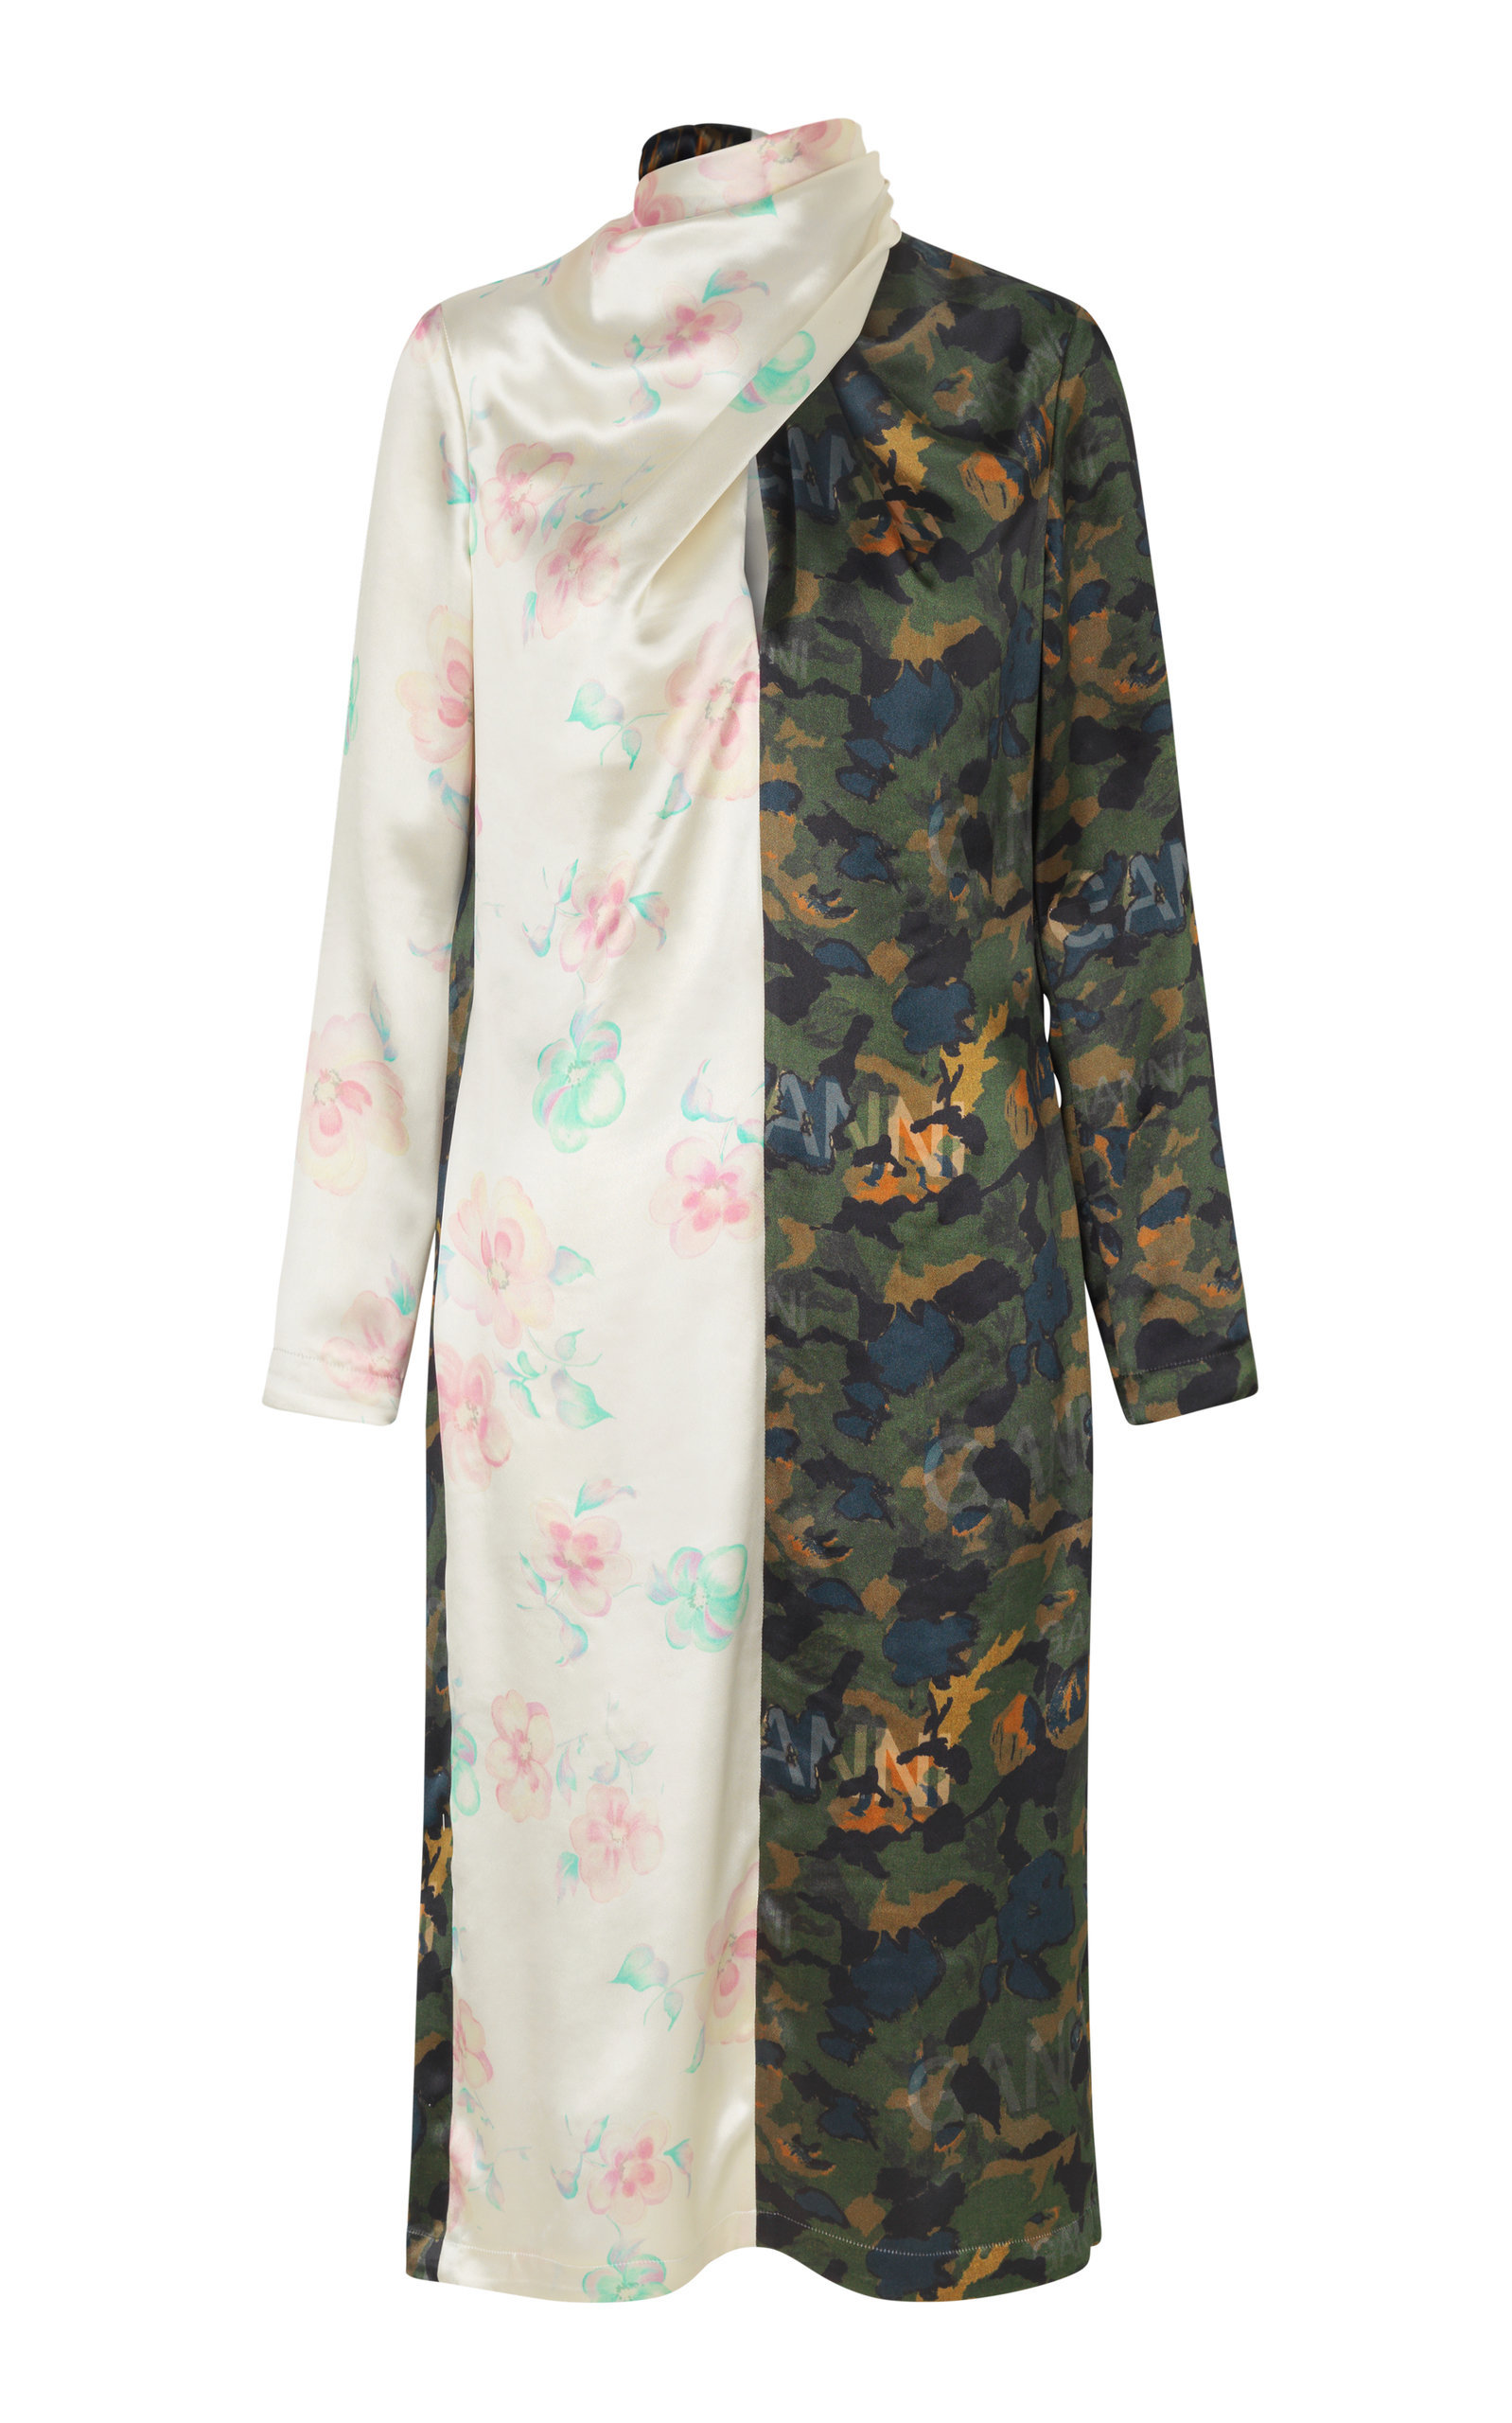 Scarf-Detailed Printed Satin Dress